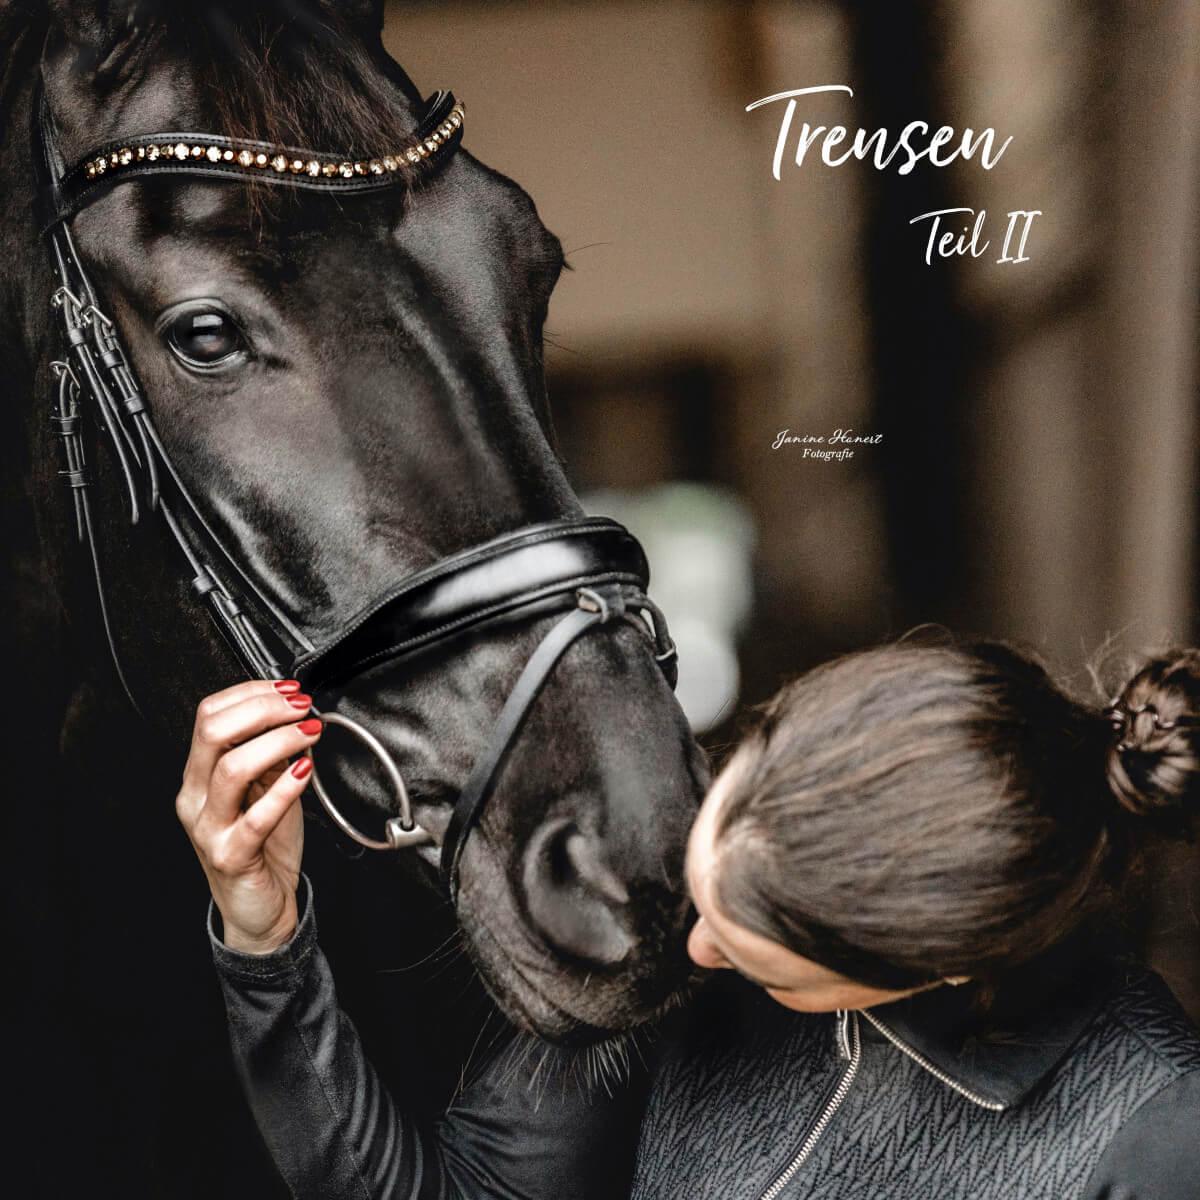 Die Anatomie des Pferdekopfes in Hinblick auf die Trense